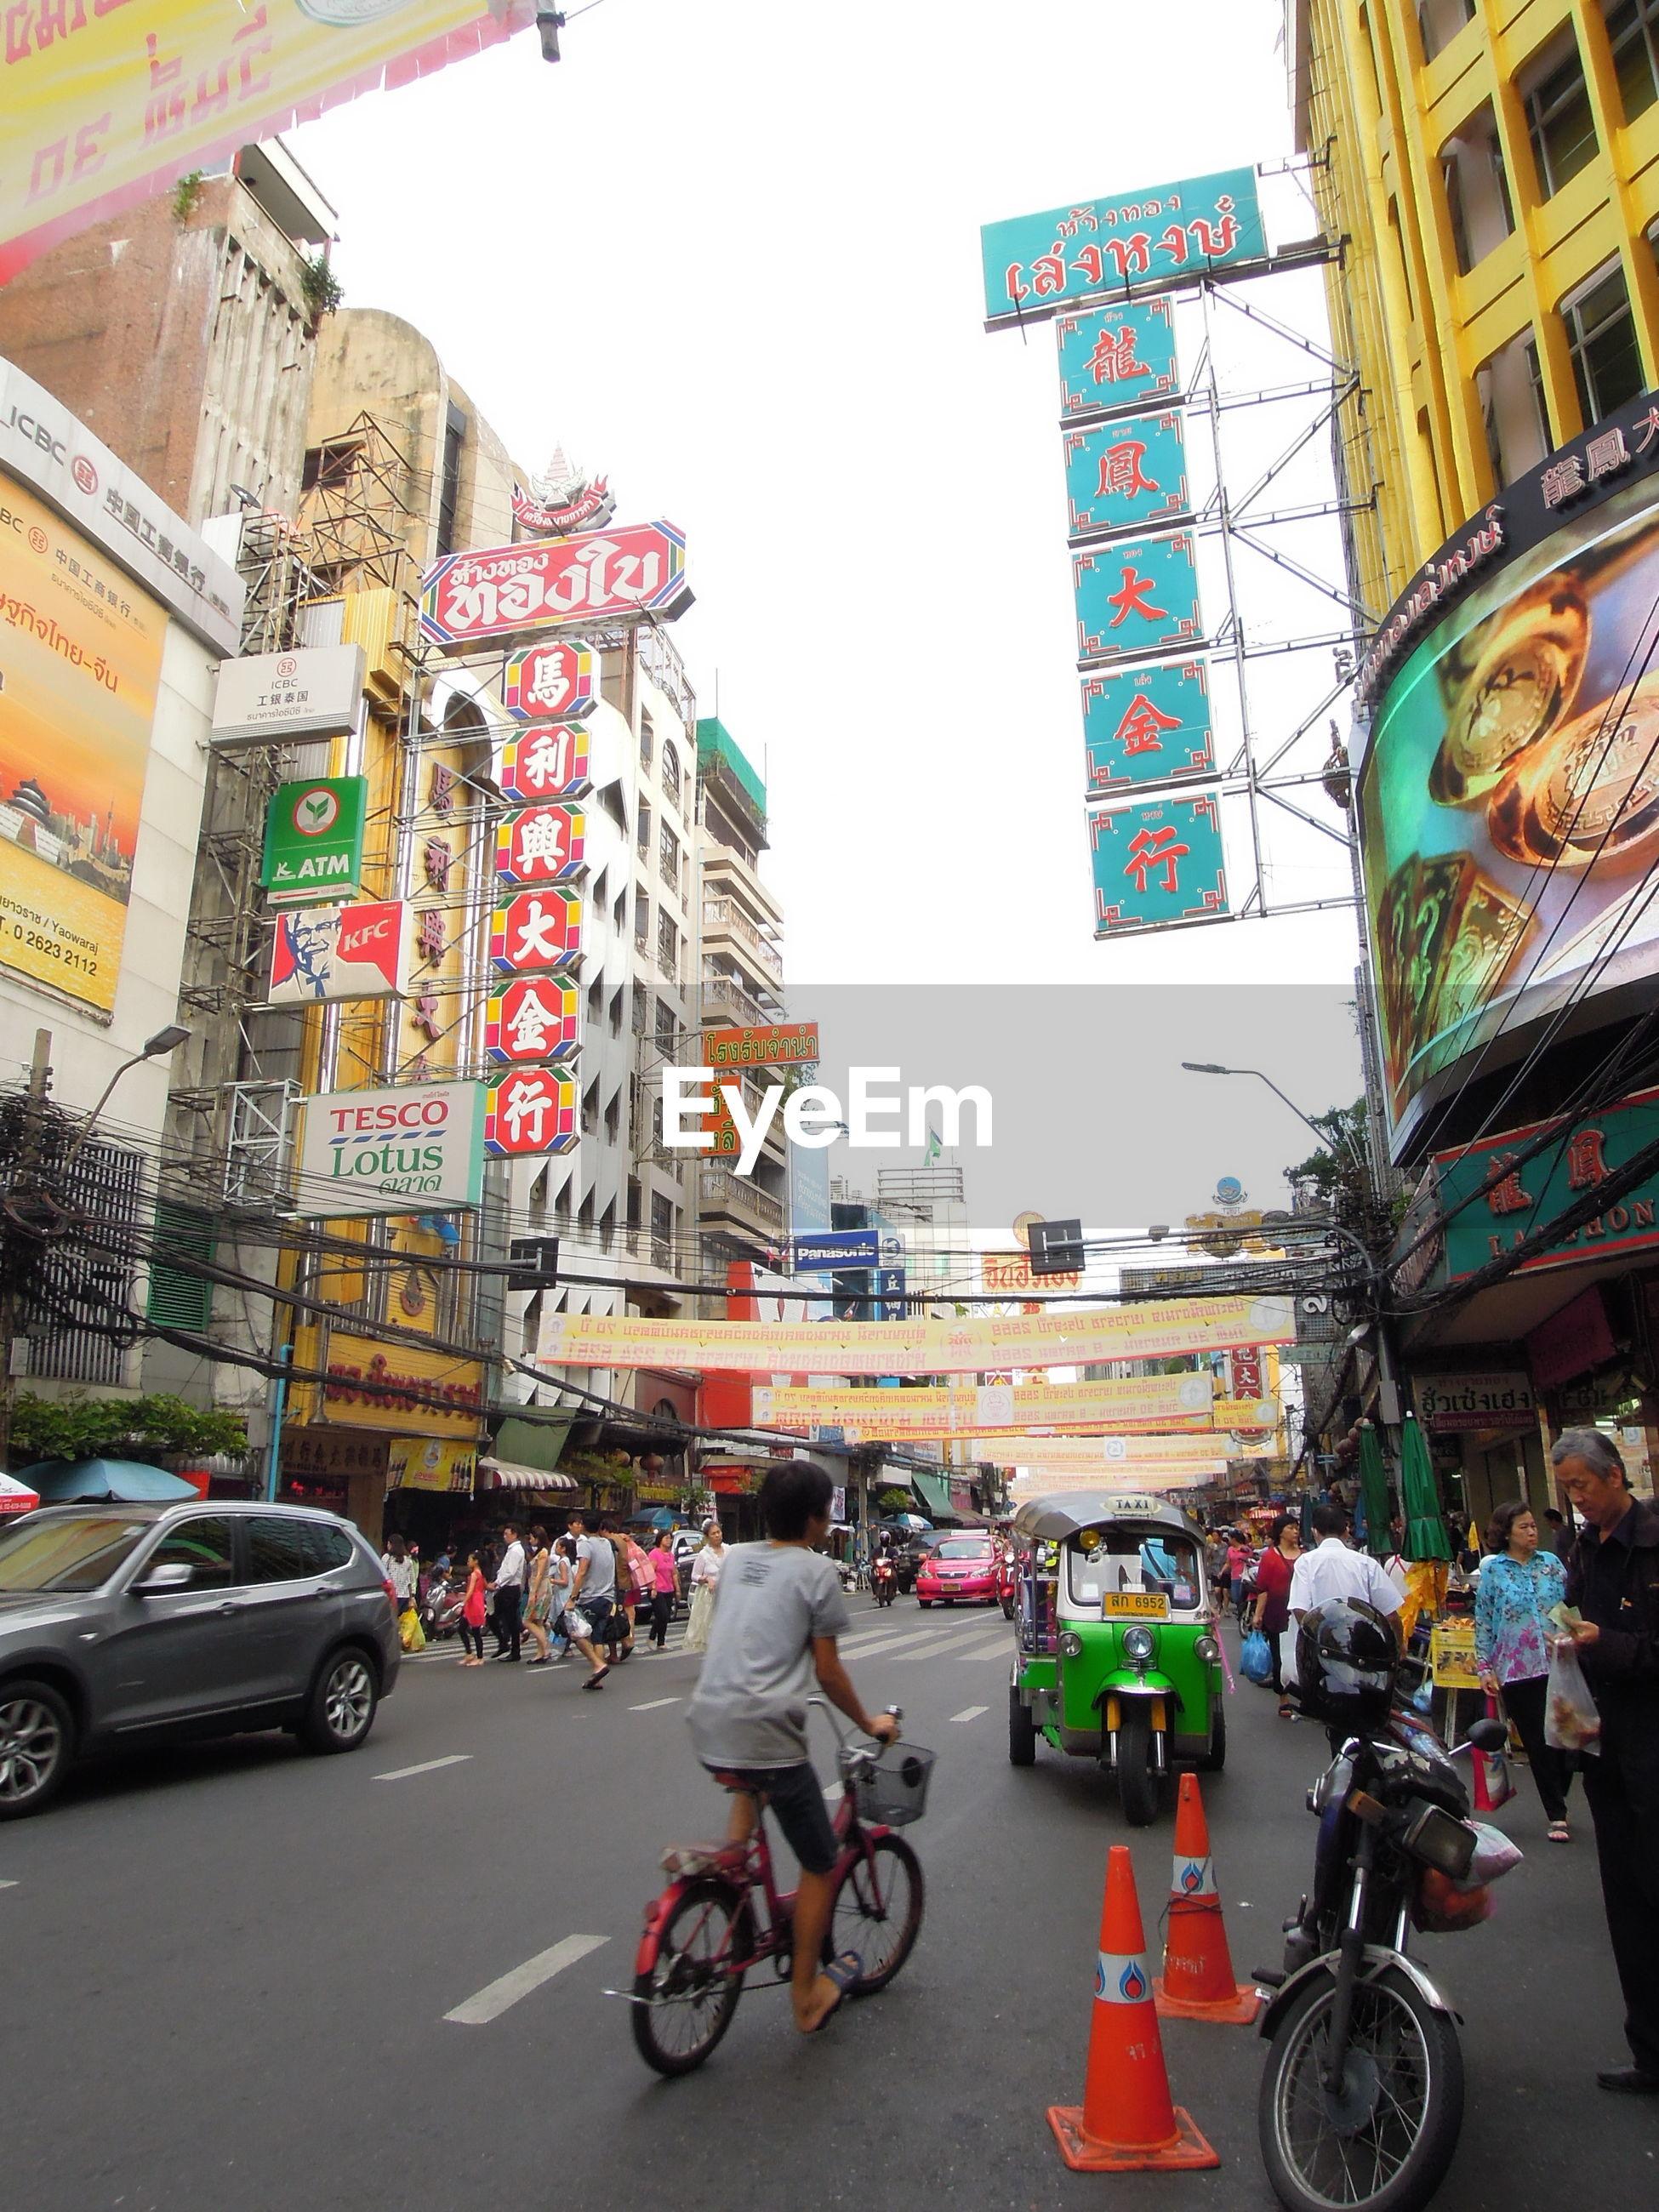 VEHICLES ON CITY STREET